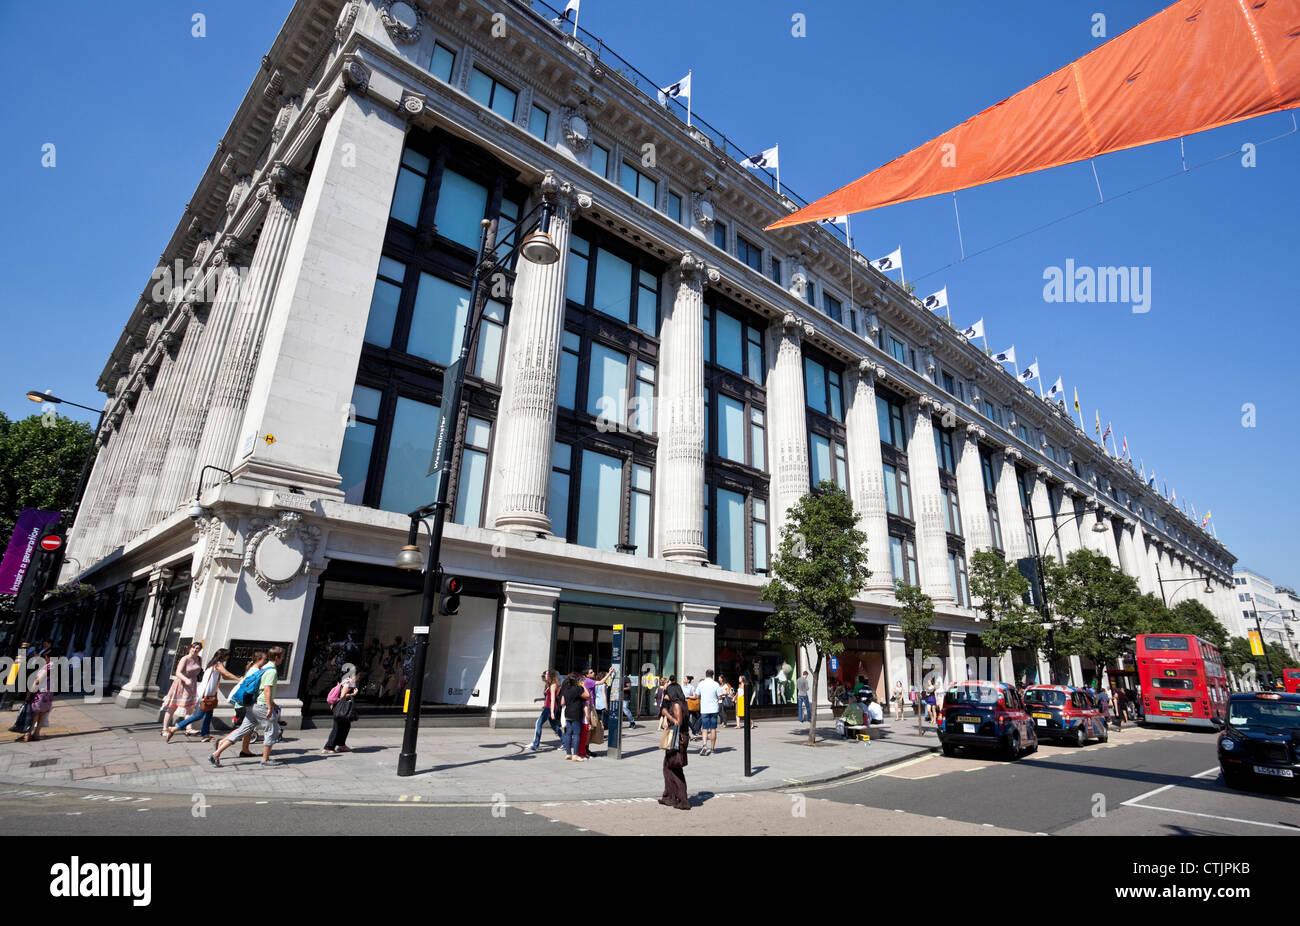 Selfridges Oxford Street store, London, England, UK - Stock Image